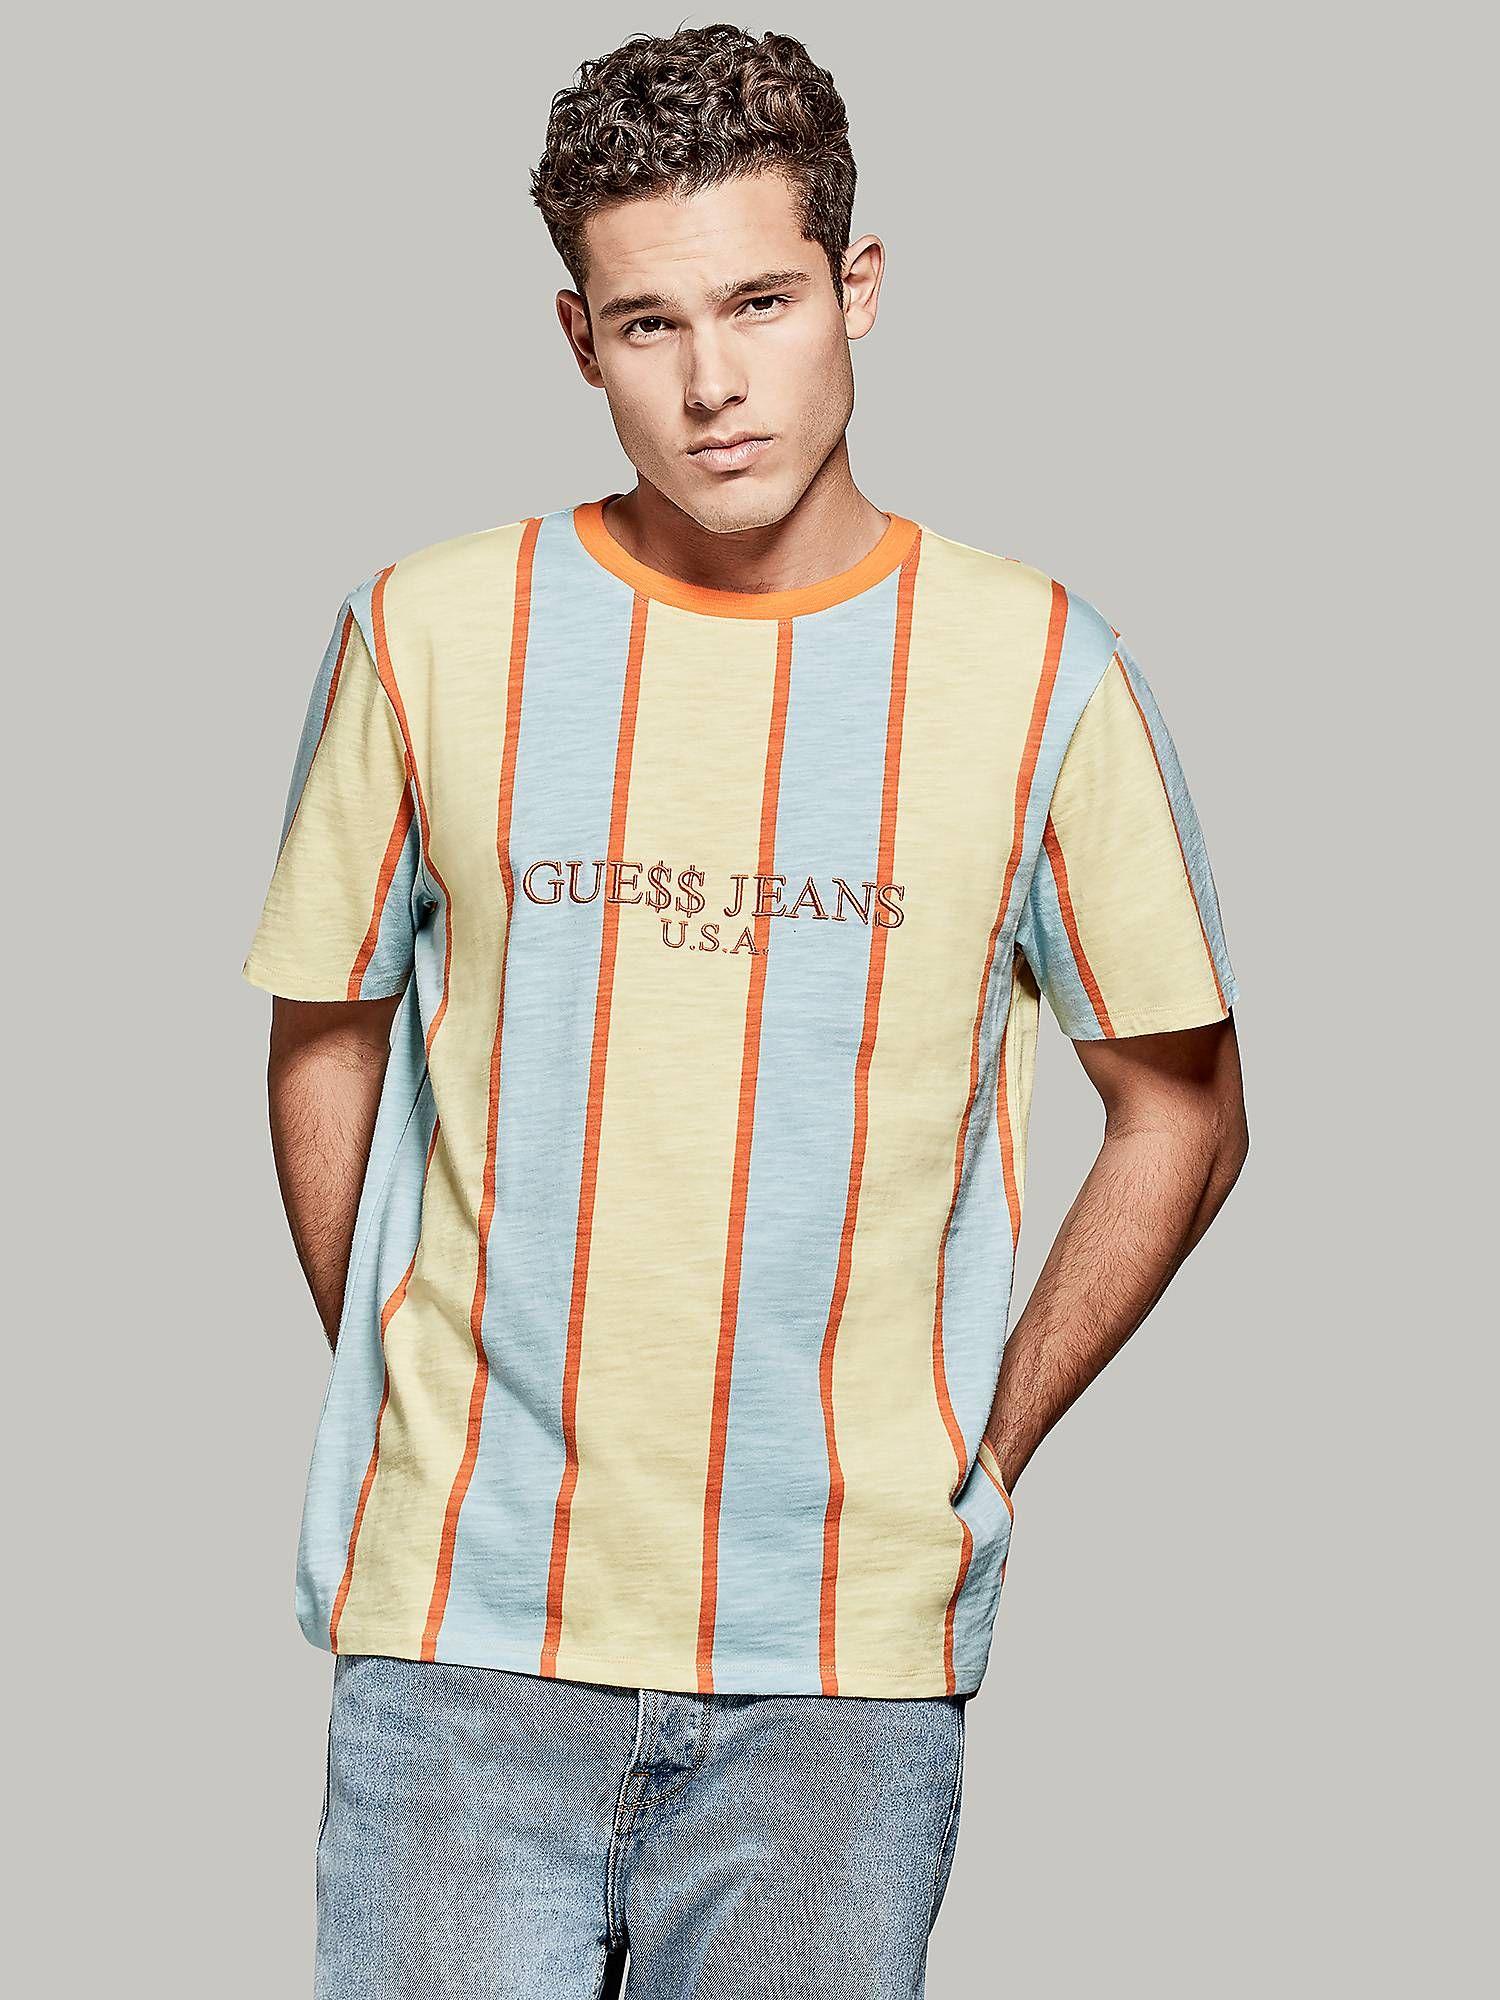 16d8ecf025 Guess Jeans Asap Rocky Sweatshirt